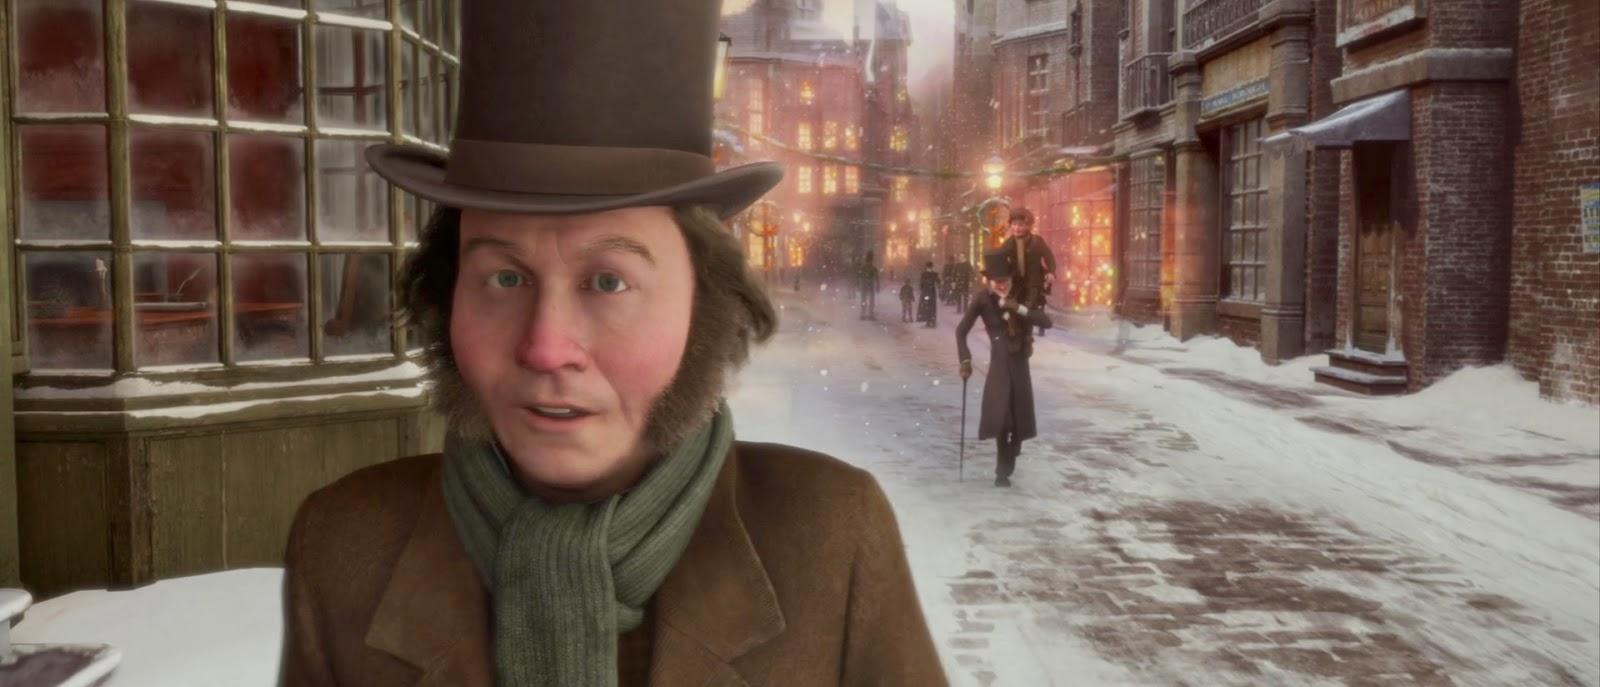 a christmas carol 2009 imdb - A Christmas Carol Imdb